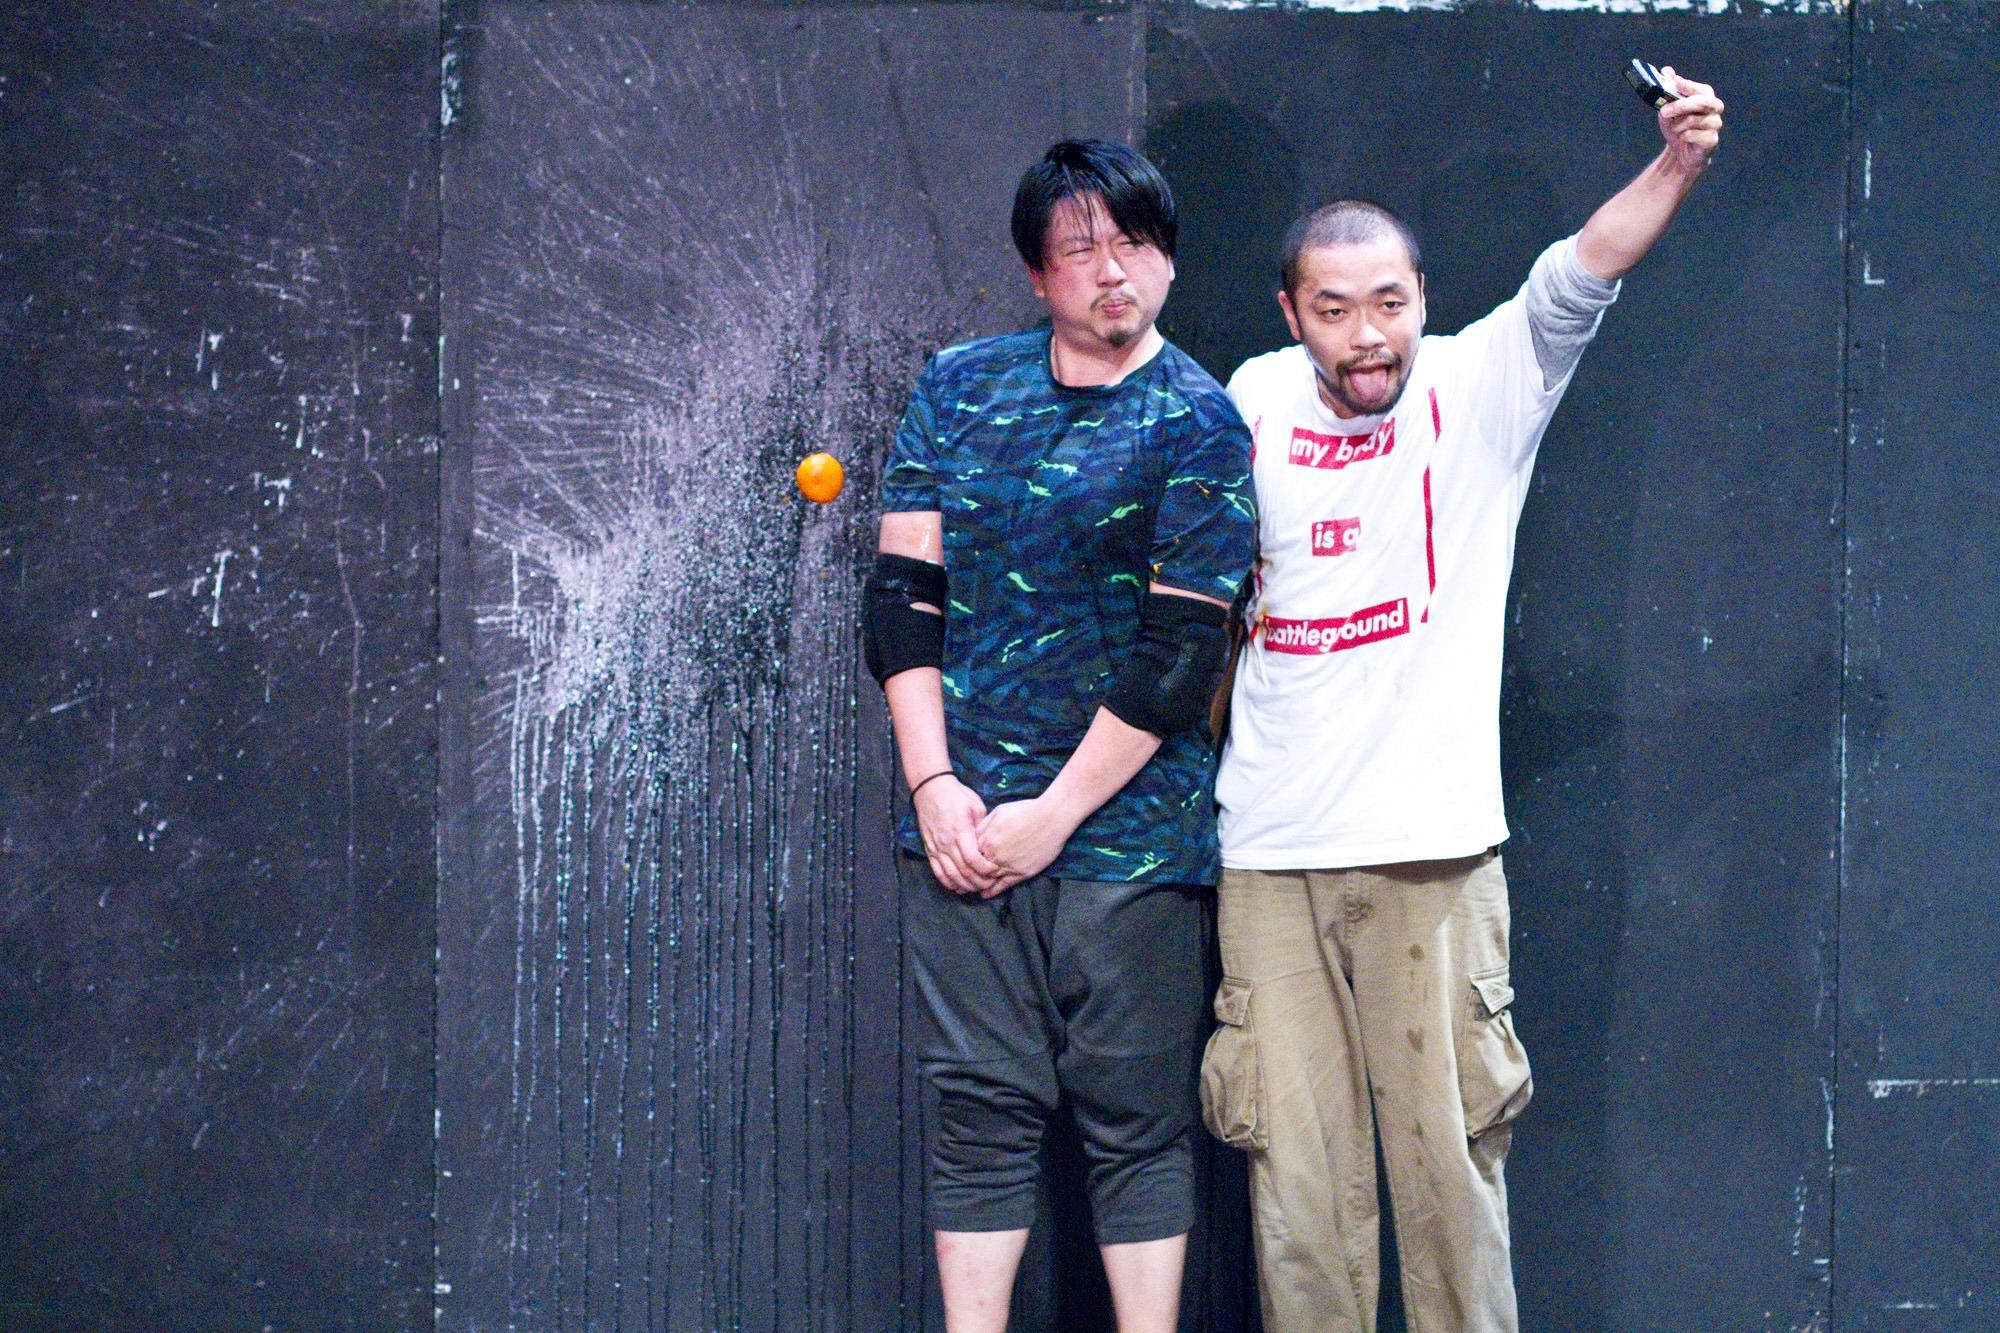 Choy Ka Fai (left) and Yuya Tsukahara (right) anticipate the impact of an incoming orange.Image: Choy Ka Fai/Sadler's Wells